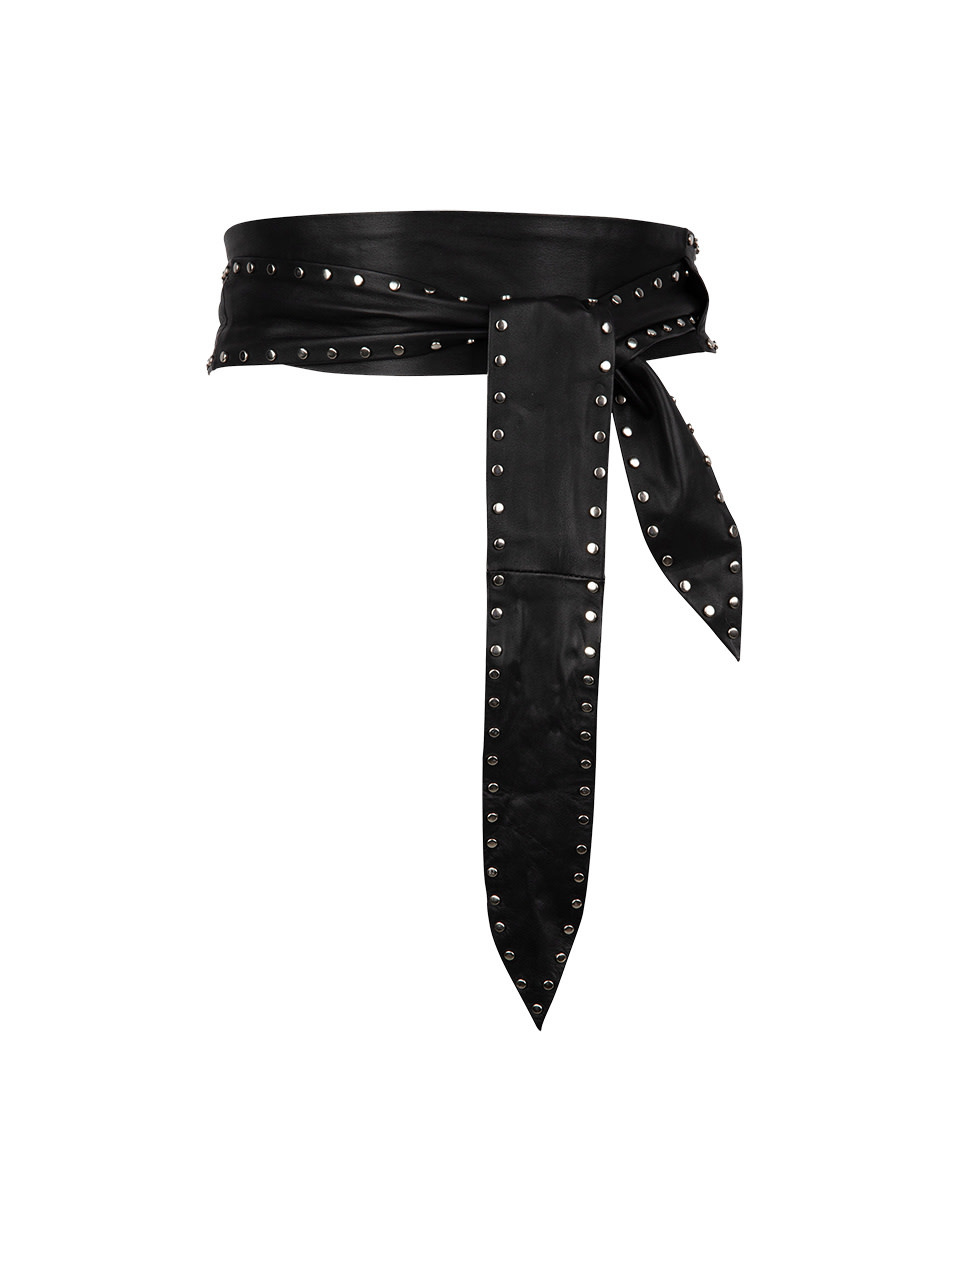 New Markala leather belt black-1